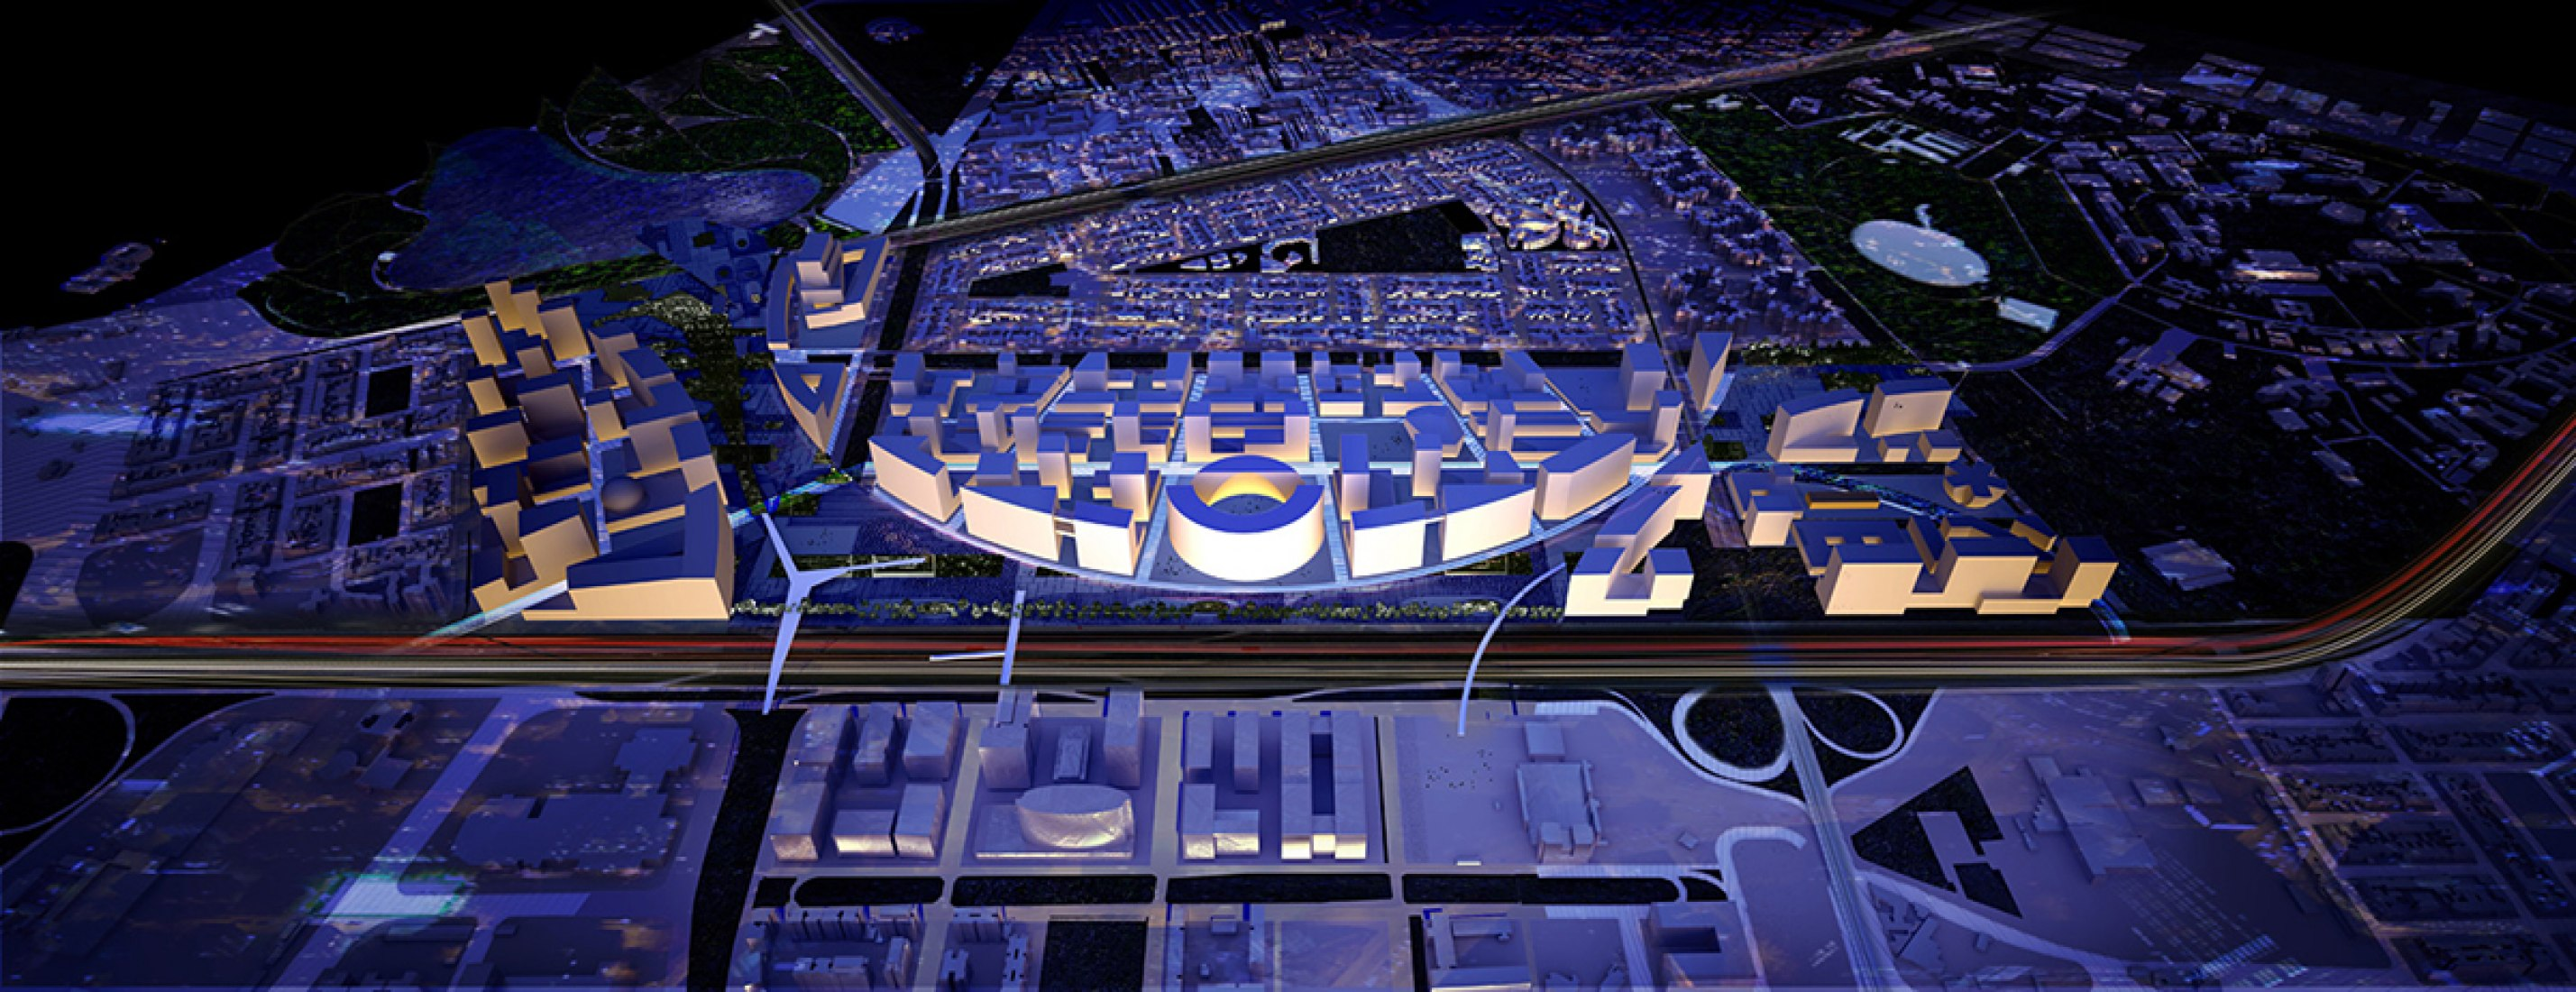 Model. New Bogotá Civic Center Masterplan by OMA.